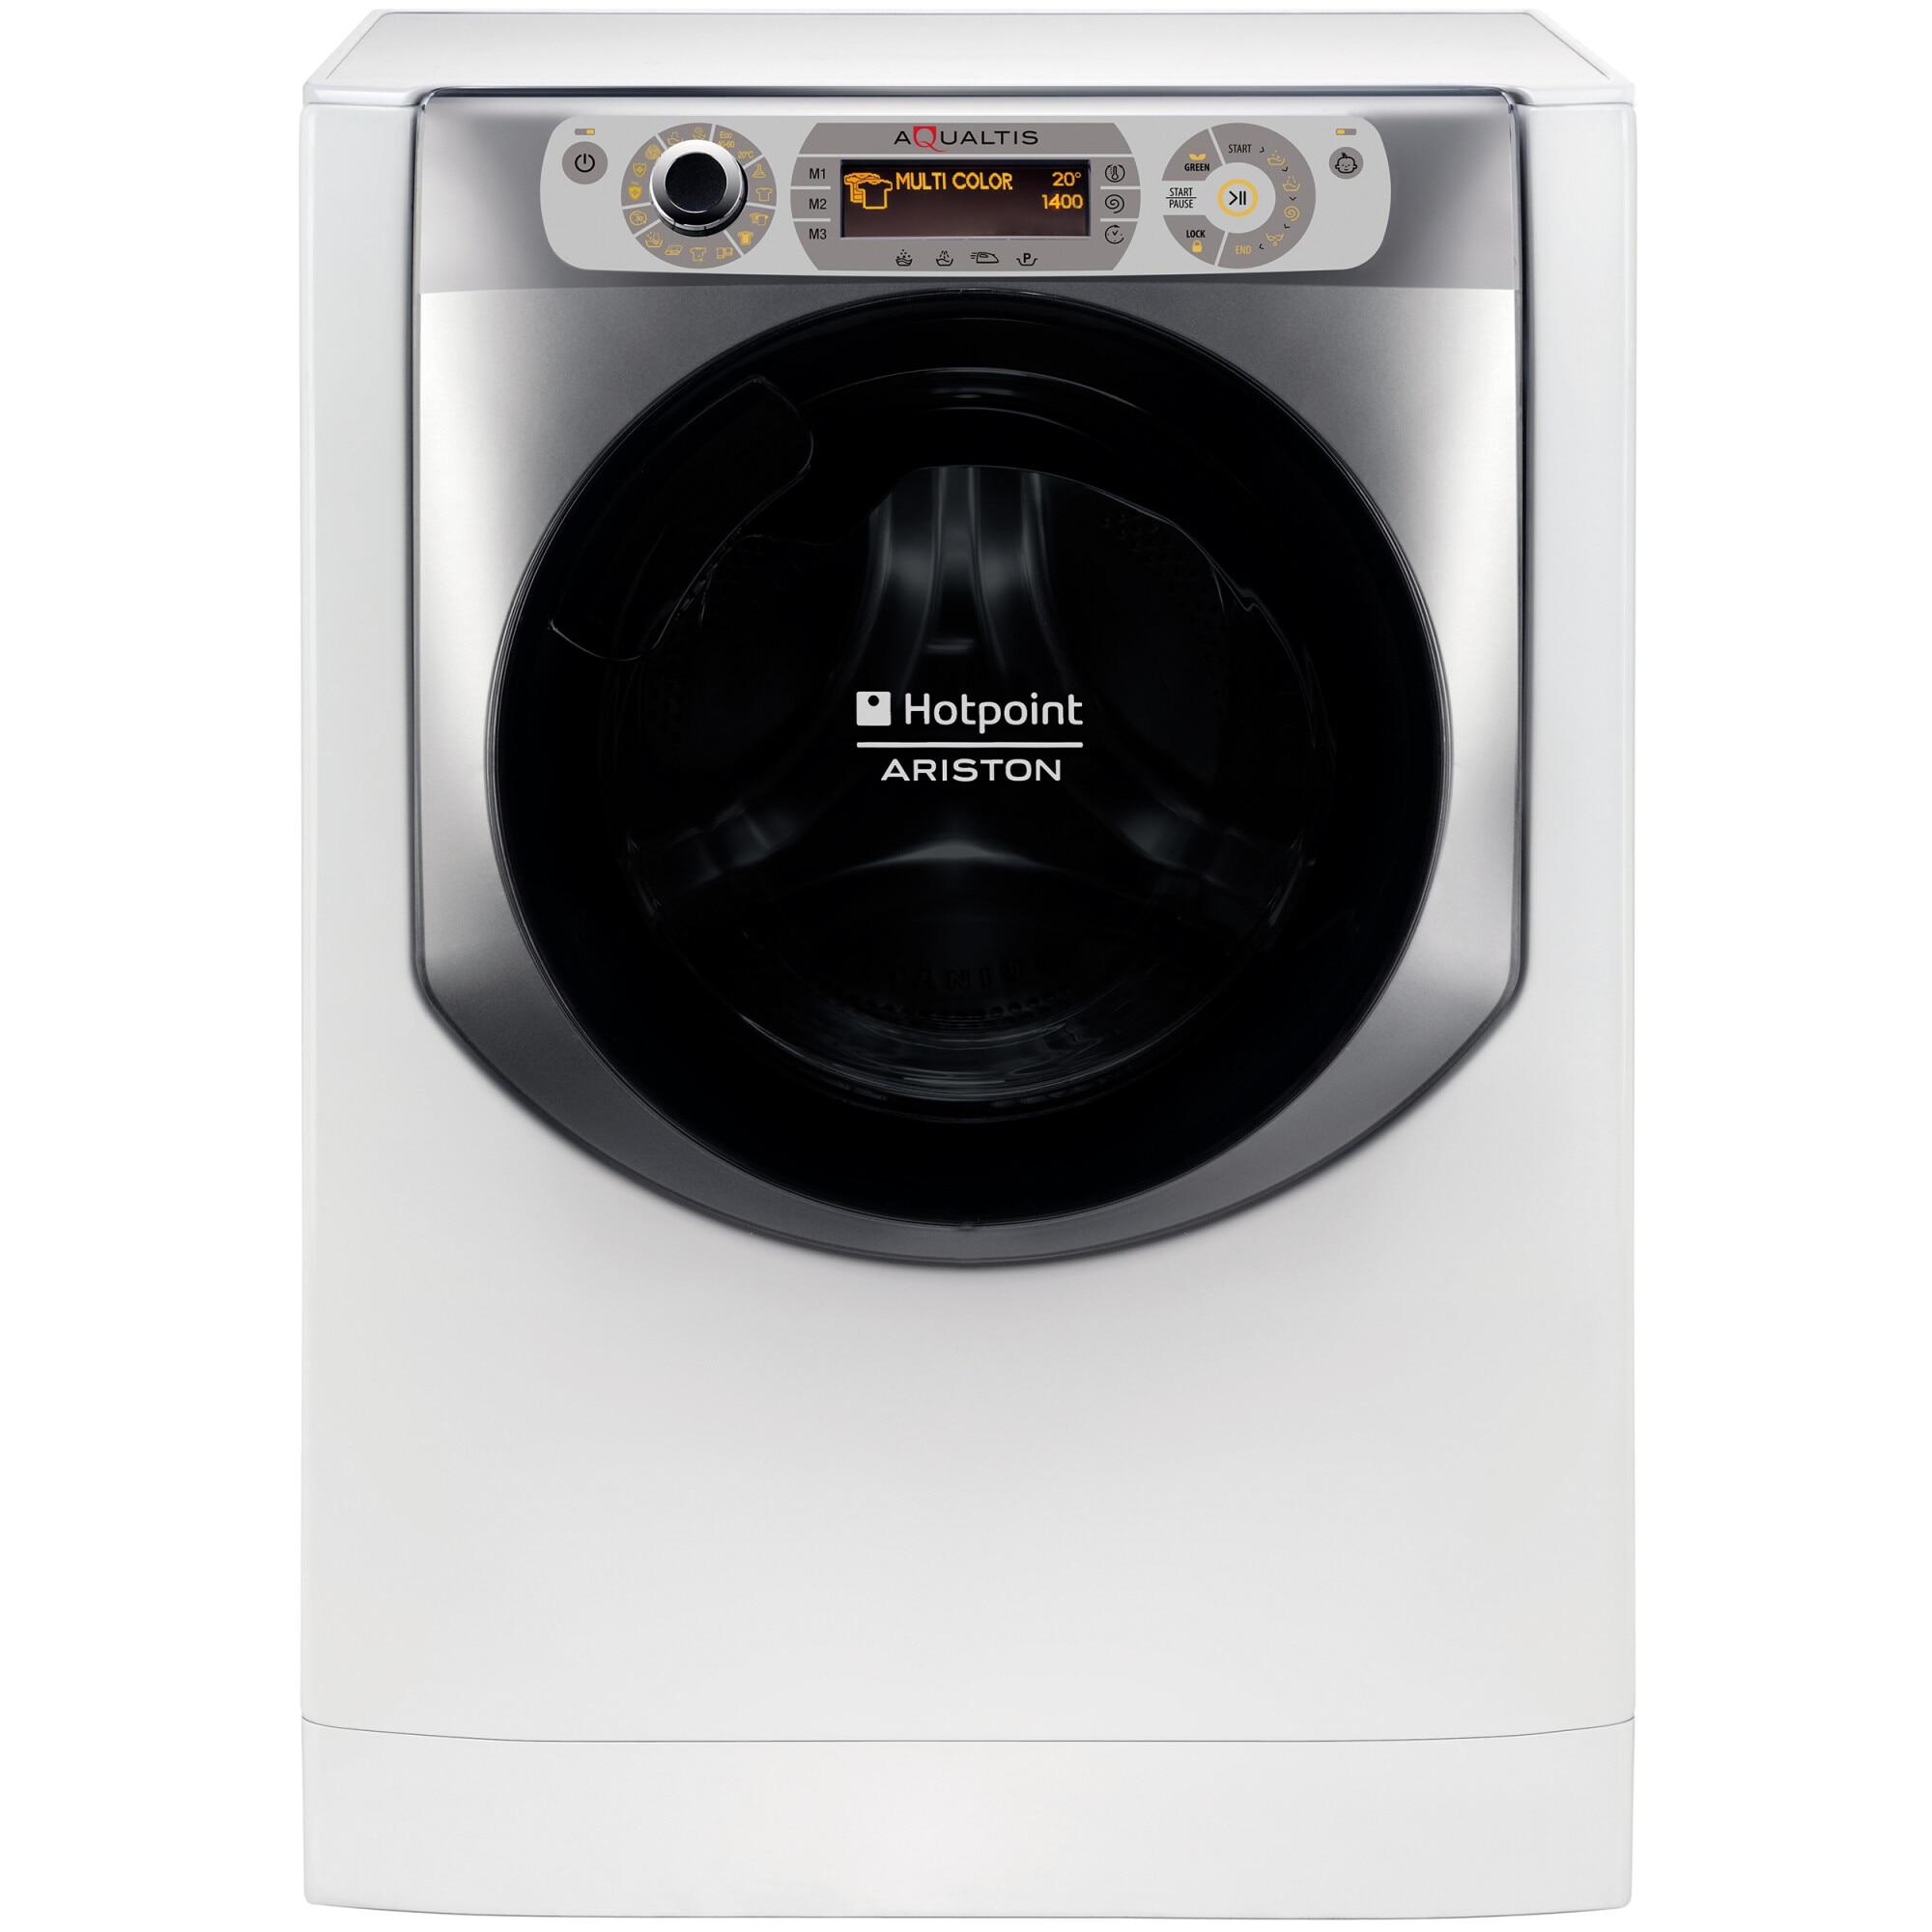 Fotografie Masina de spalat rufe Hotpoint AQ116D68SDEN, 11 kg, 1600 rpm, Clasa C, Recunoastere grad murdarie, Display LCD, Alb